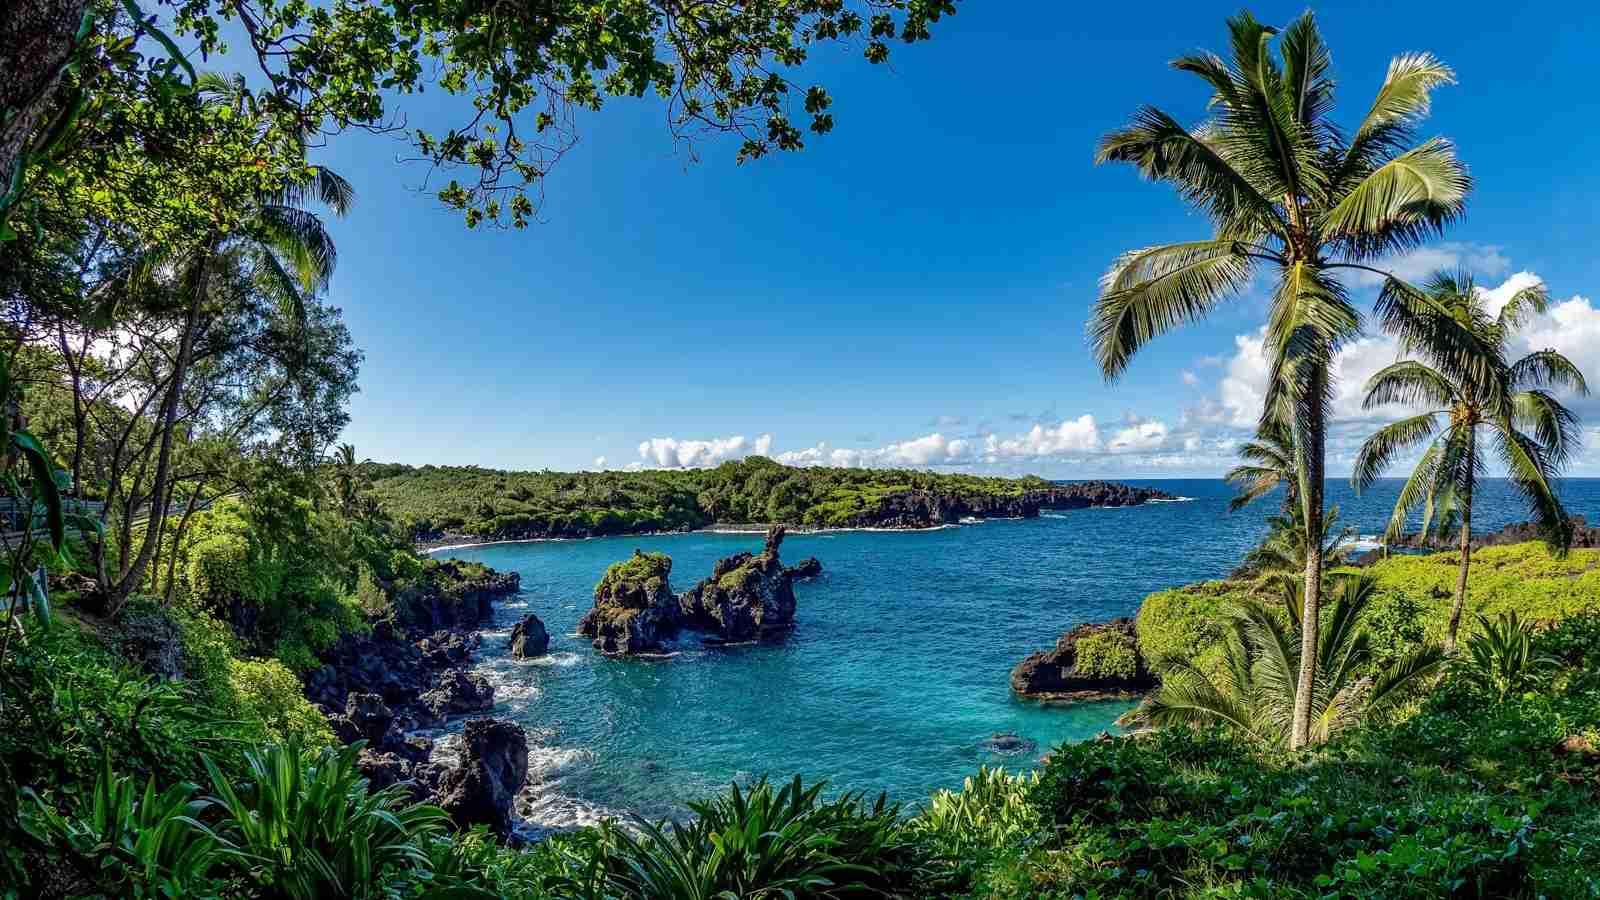 A view off the Road to Hana in Maui, Hawaii. (Photo by Sean Bernstein via Unsplash)